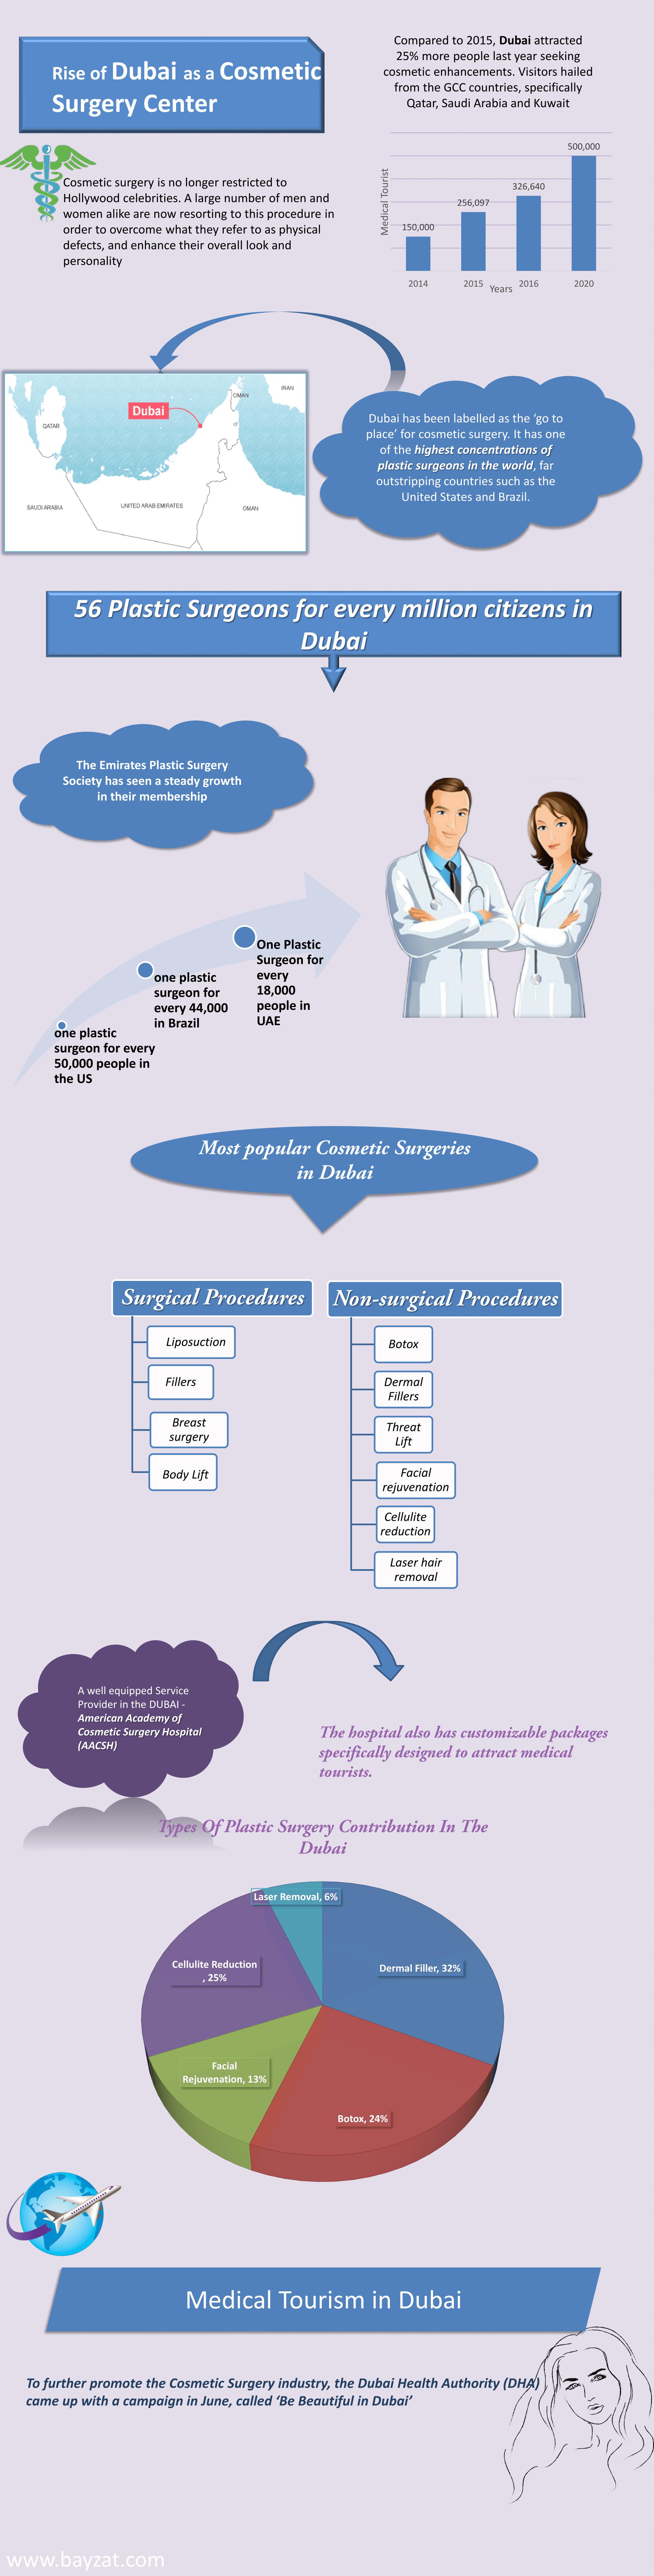 Health insurance image by Talal bayzat Medical tourism